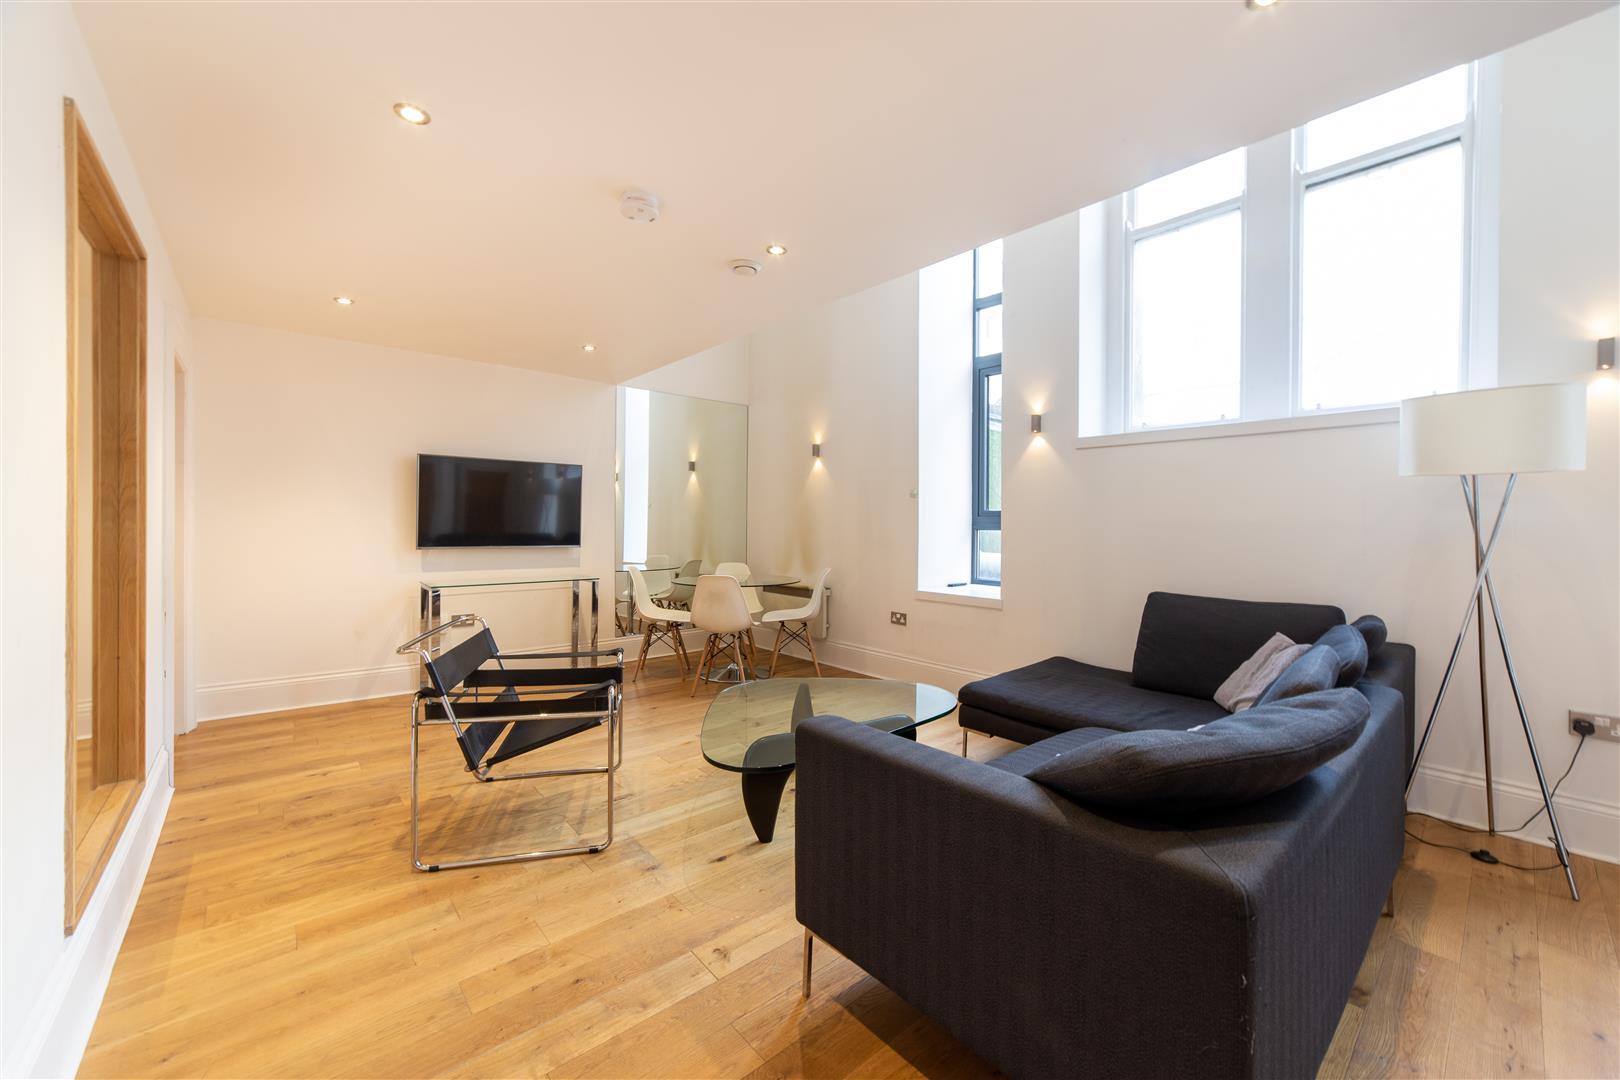 3 bed apartment to rent in Grainger Street, City Centre, NE1